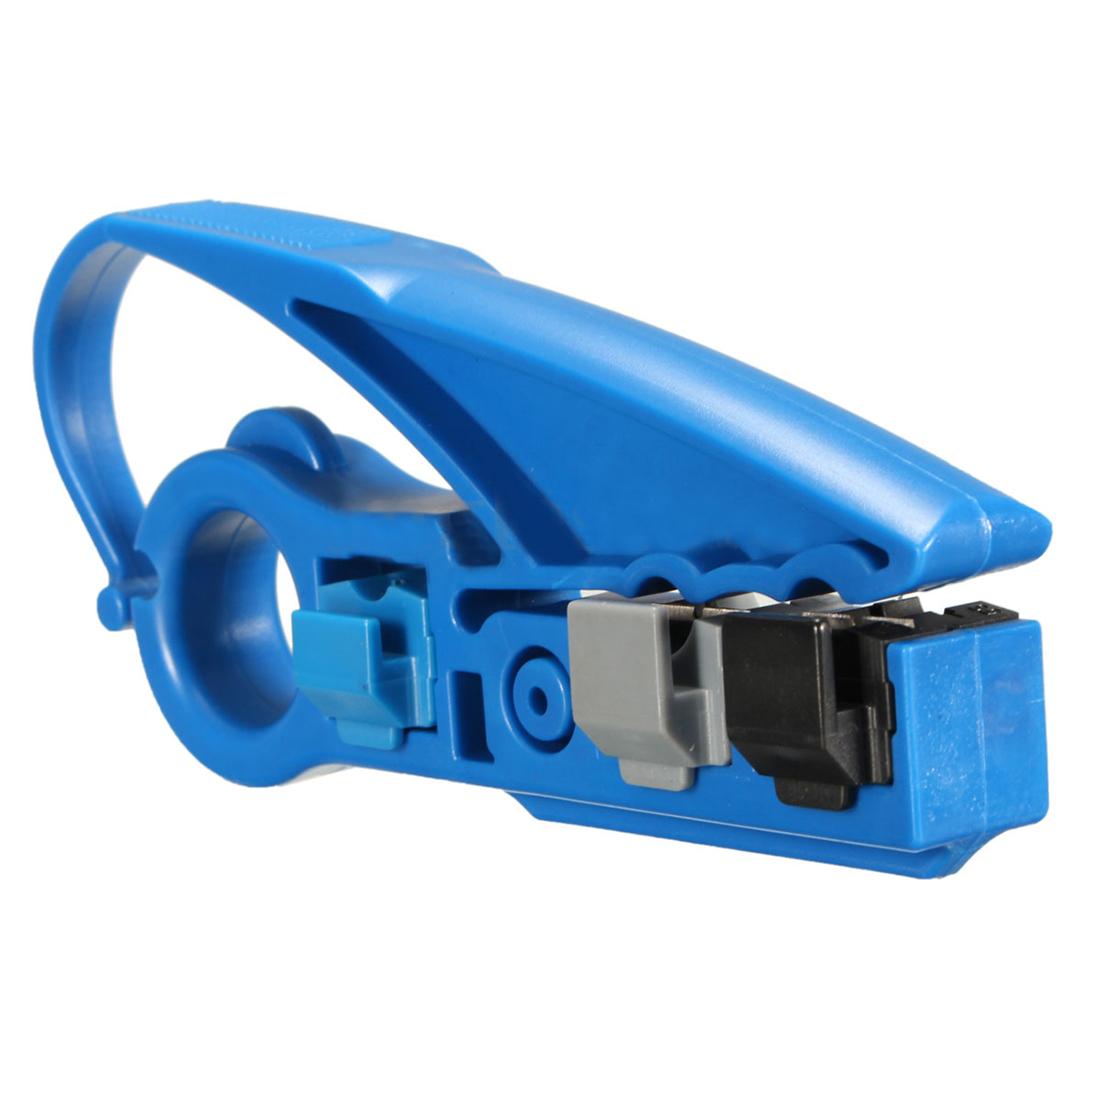 6X(Coax Koaxial UTP Kabel Cat5e Cat6 RG11 / RG6 / RG59 Draht ...